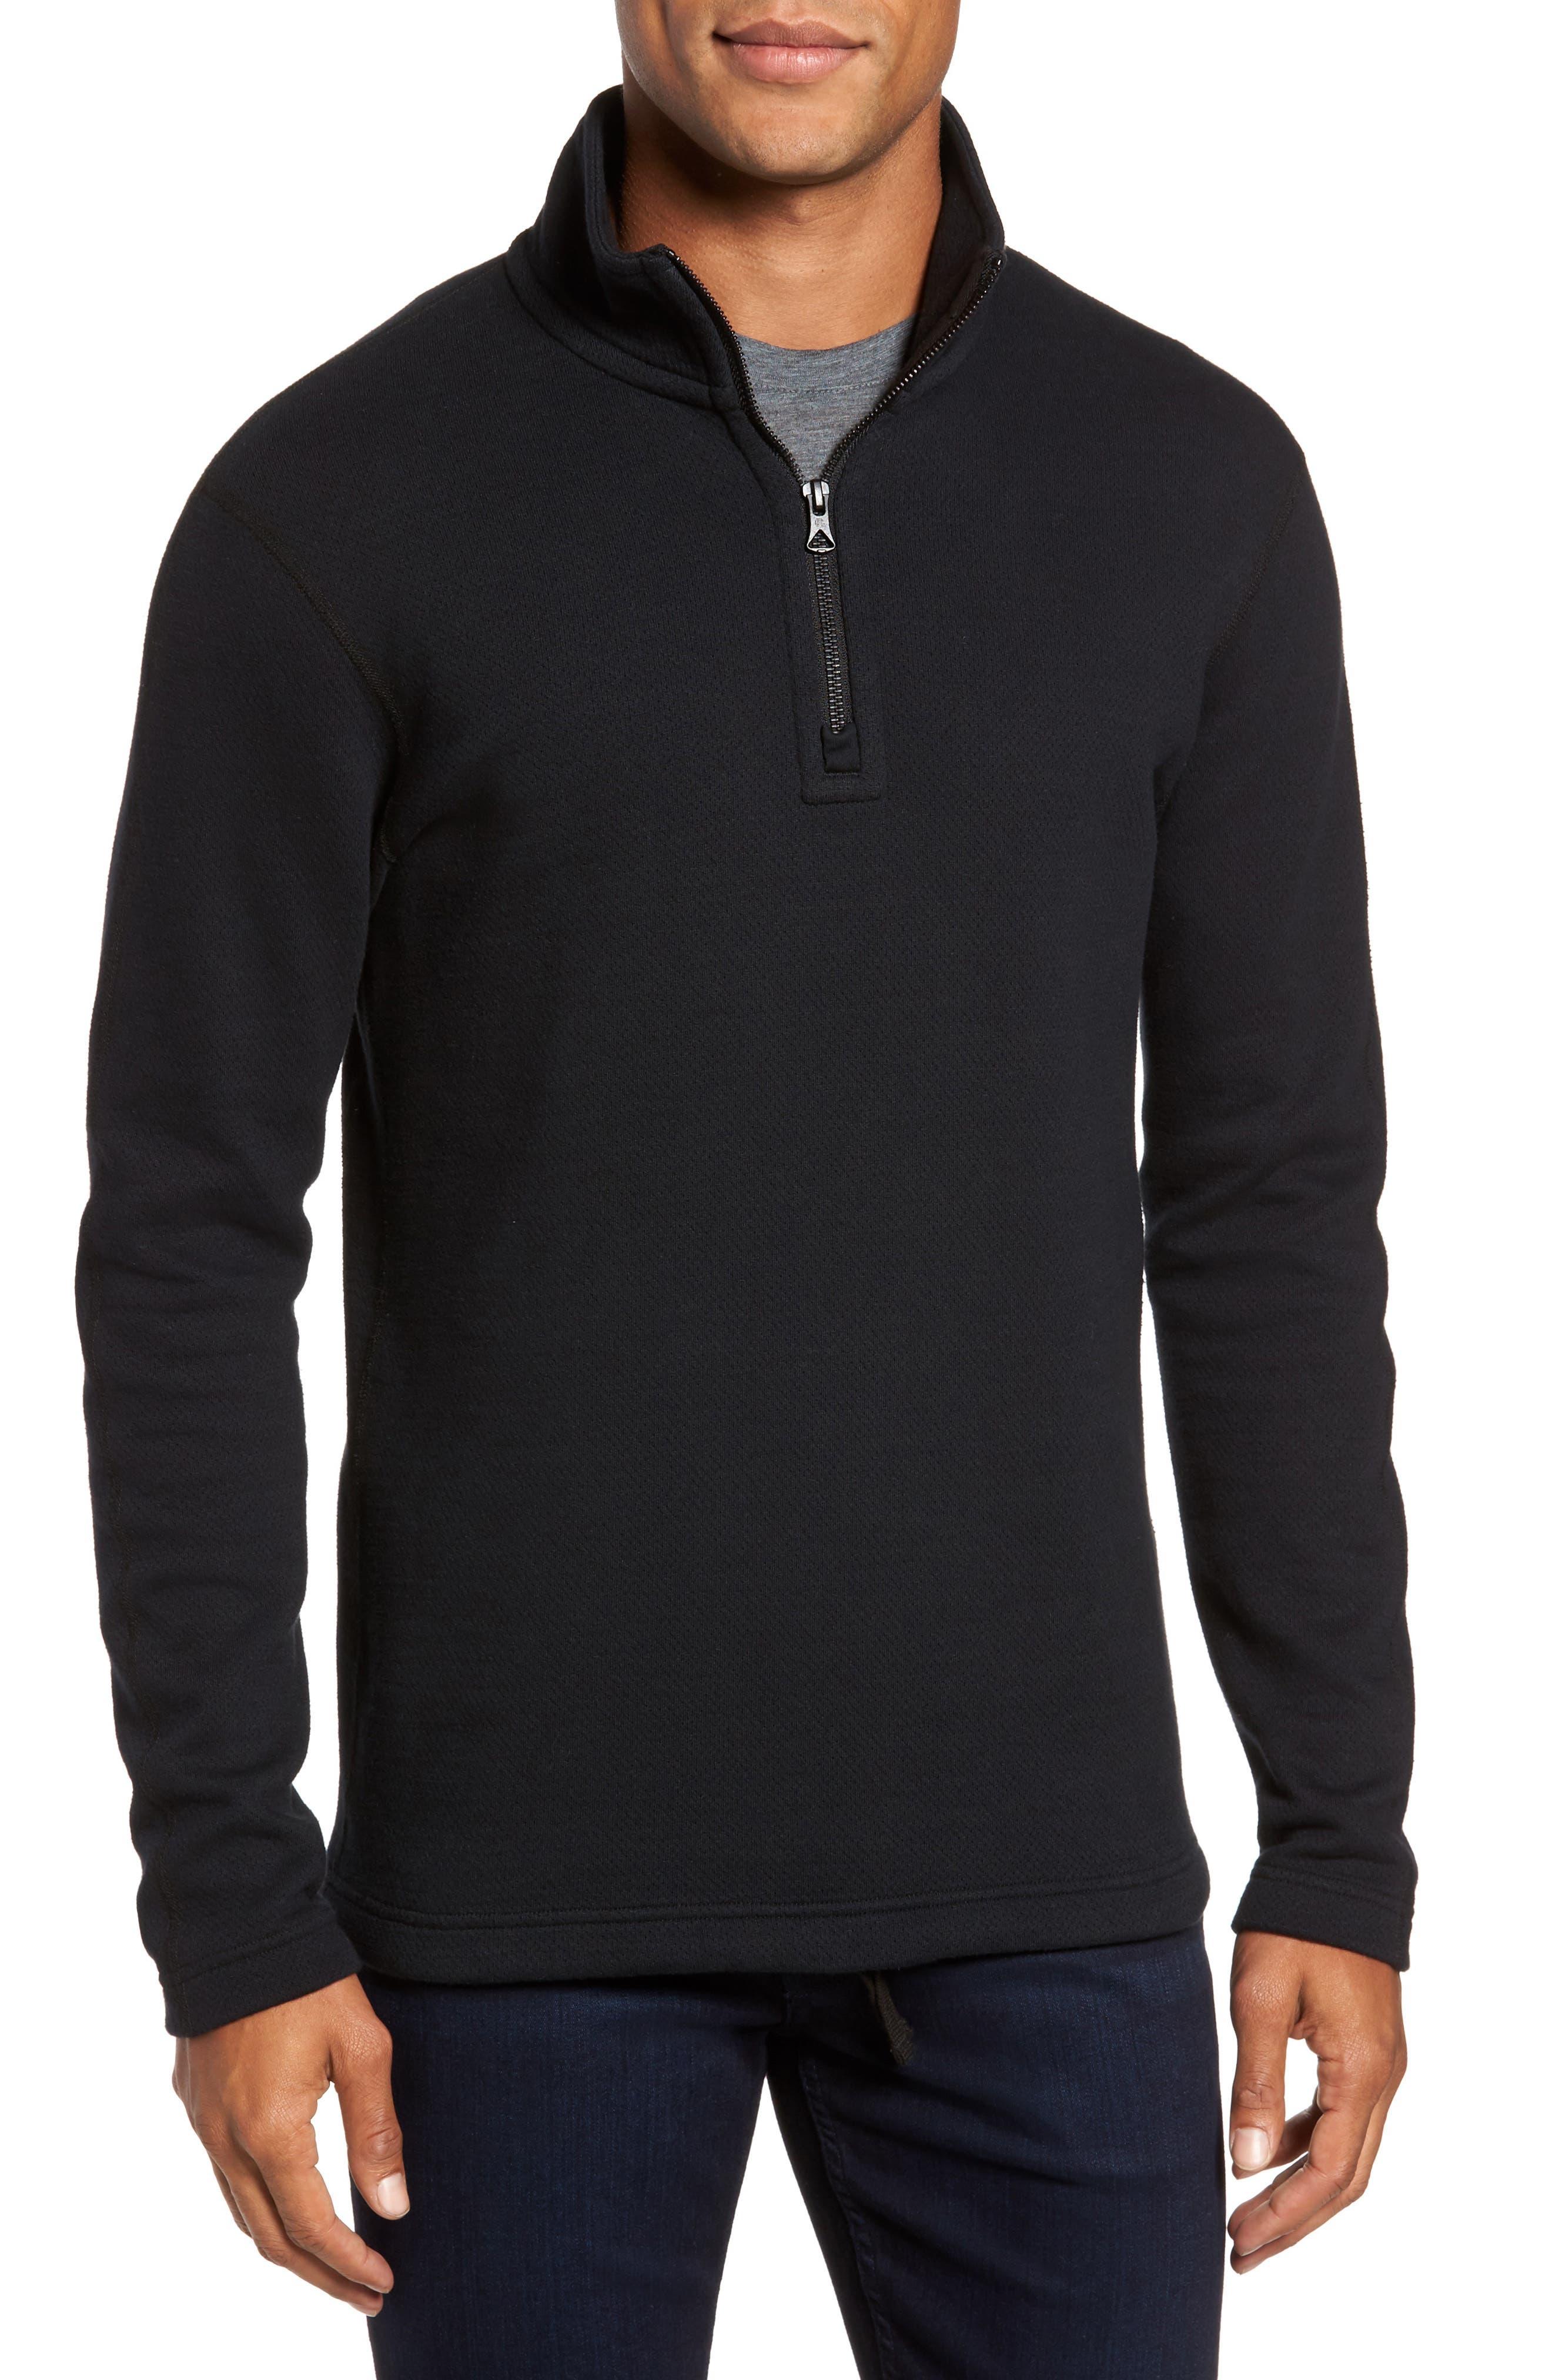 Mesh Half Zip Fleece Top,                             Main thumbnail 1, color,                             Black